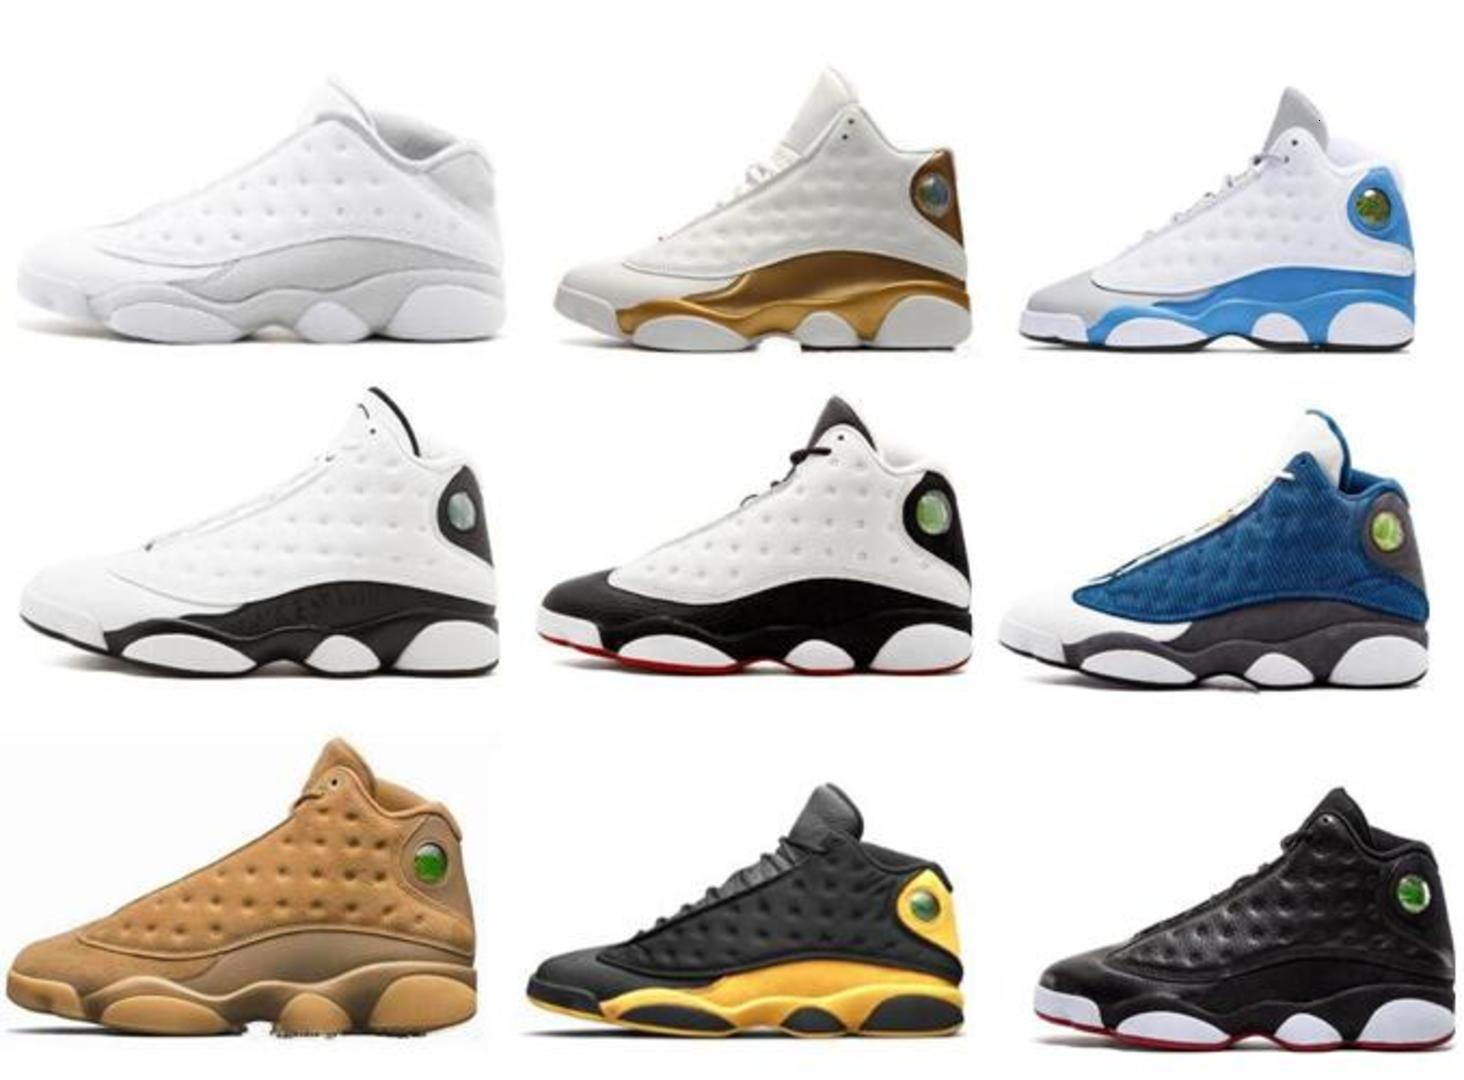 Wholesale Basketball Shoes 13 13s Sneakers Trainers Chicago 3M GS Hyper Royal Bordeaux DMP Wheat Oli NakeskinJordanRetros Sneaker